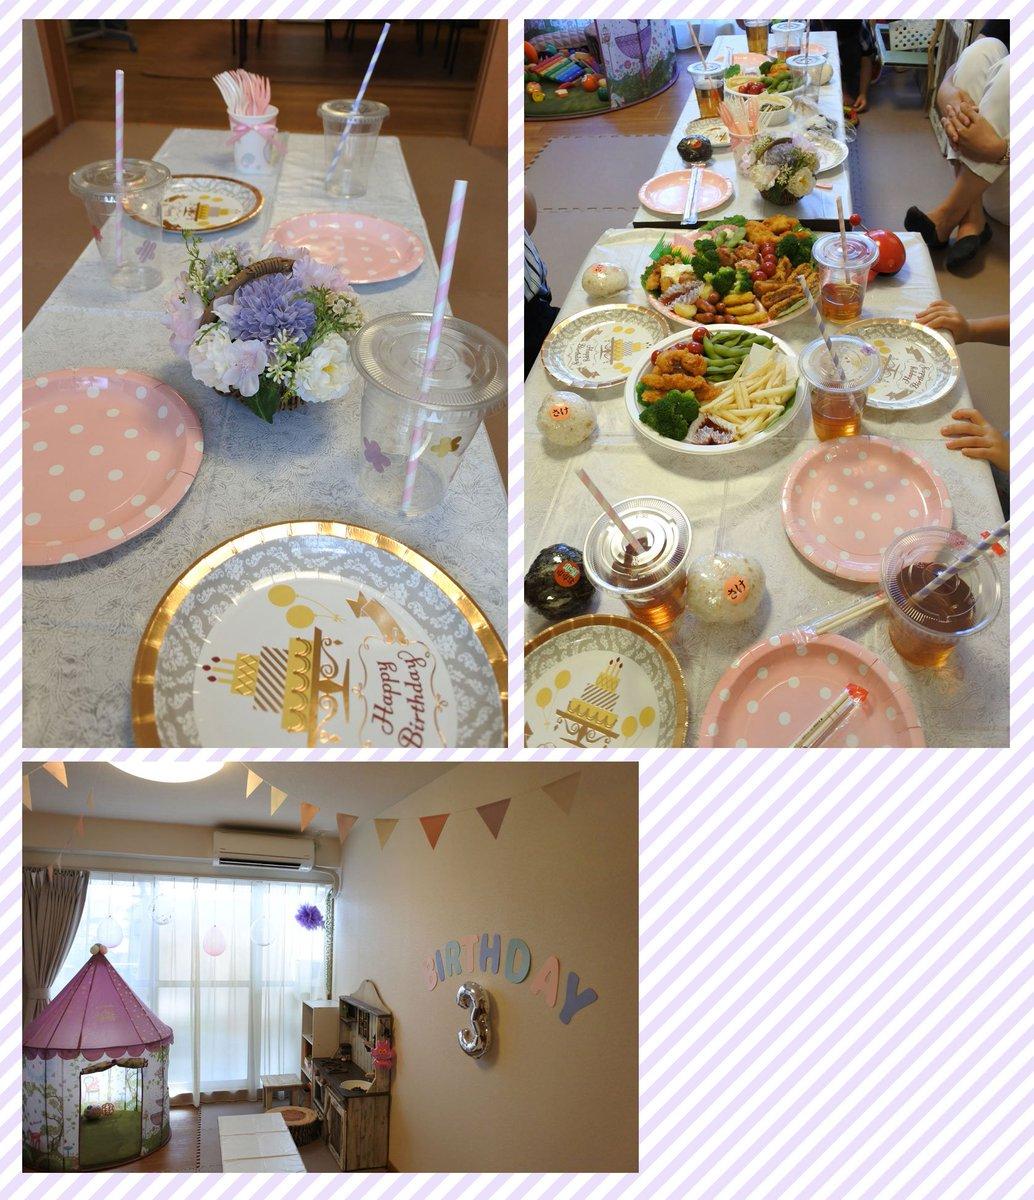 test ツイッターメディア - 先月に同じ産院のママ友達と娘の3歳のお誕生日会。 テーマカラーはパステルピンク&パープル。フラワーアレンジメントを100円ショップの造花で作りました。ピョロピョロの葉っぱだけ造花屋さんにて購入 。 #造花 #アーティフィシャルフラワー #フラワーアレンジメント #ダイソー #100円ショップ https://t.co/FIjiB0nAcr